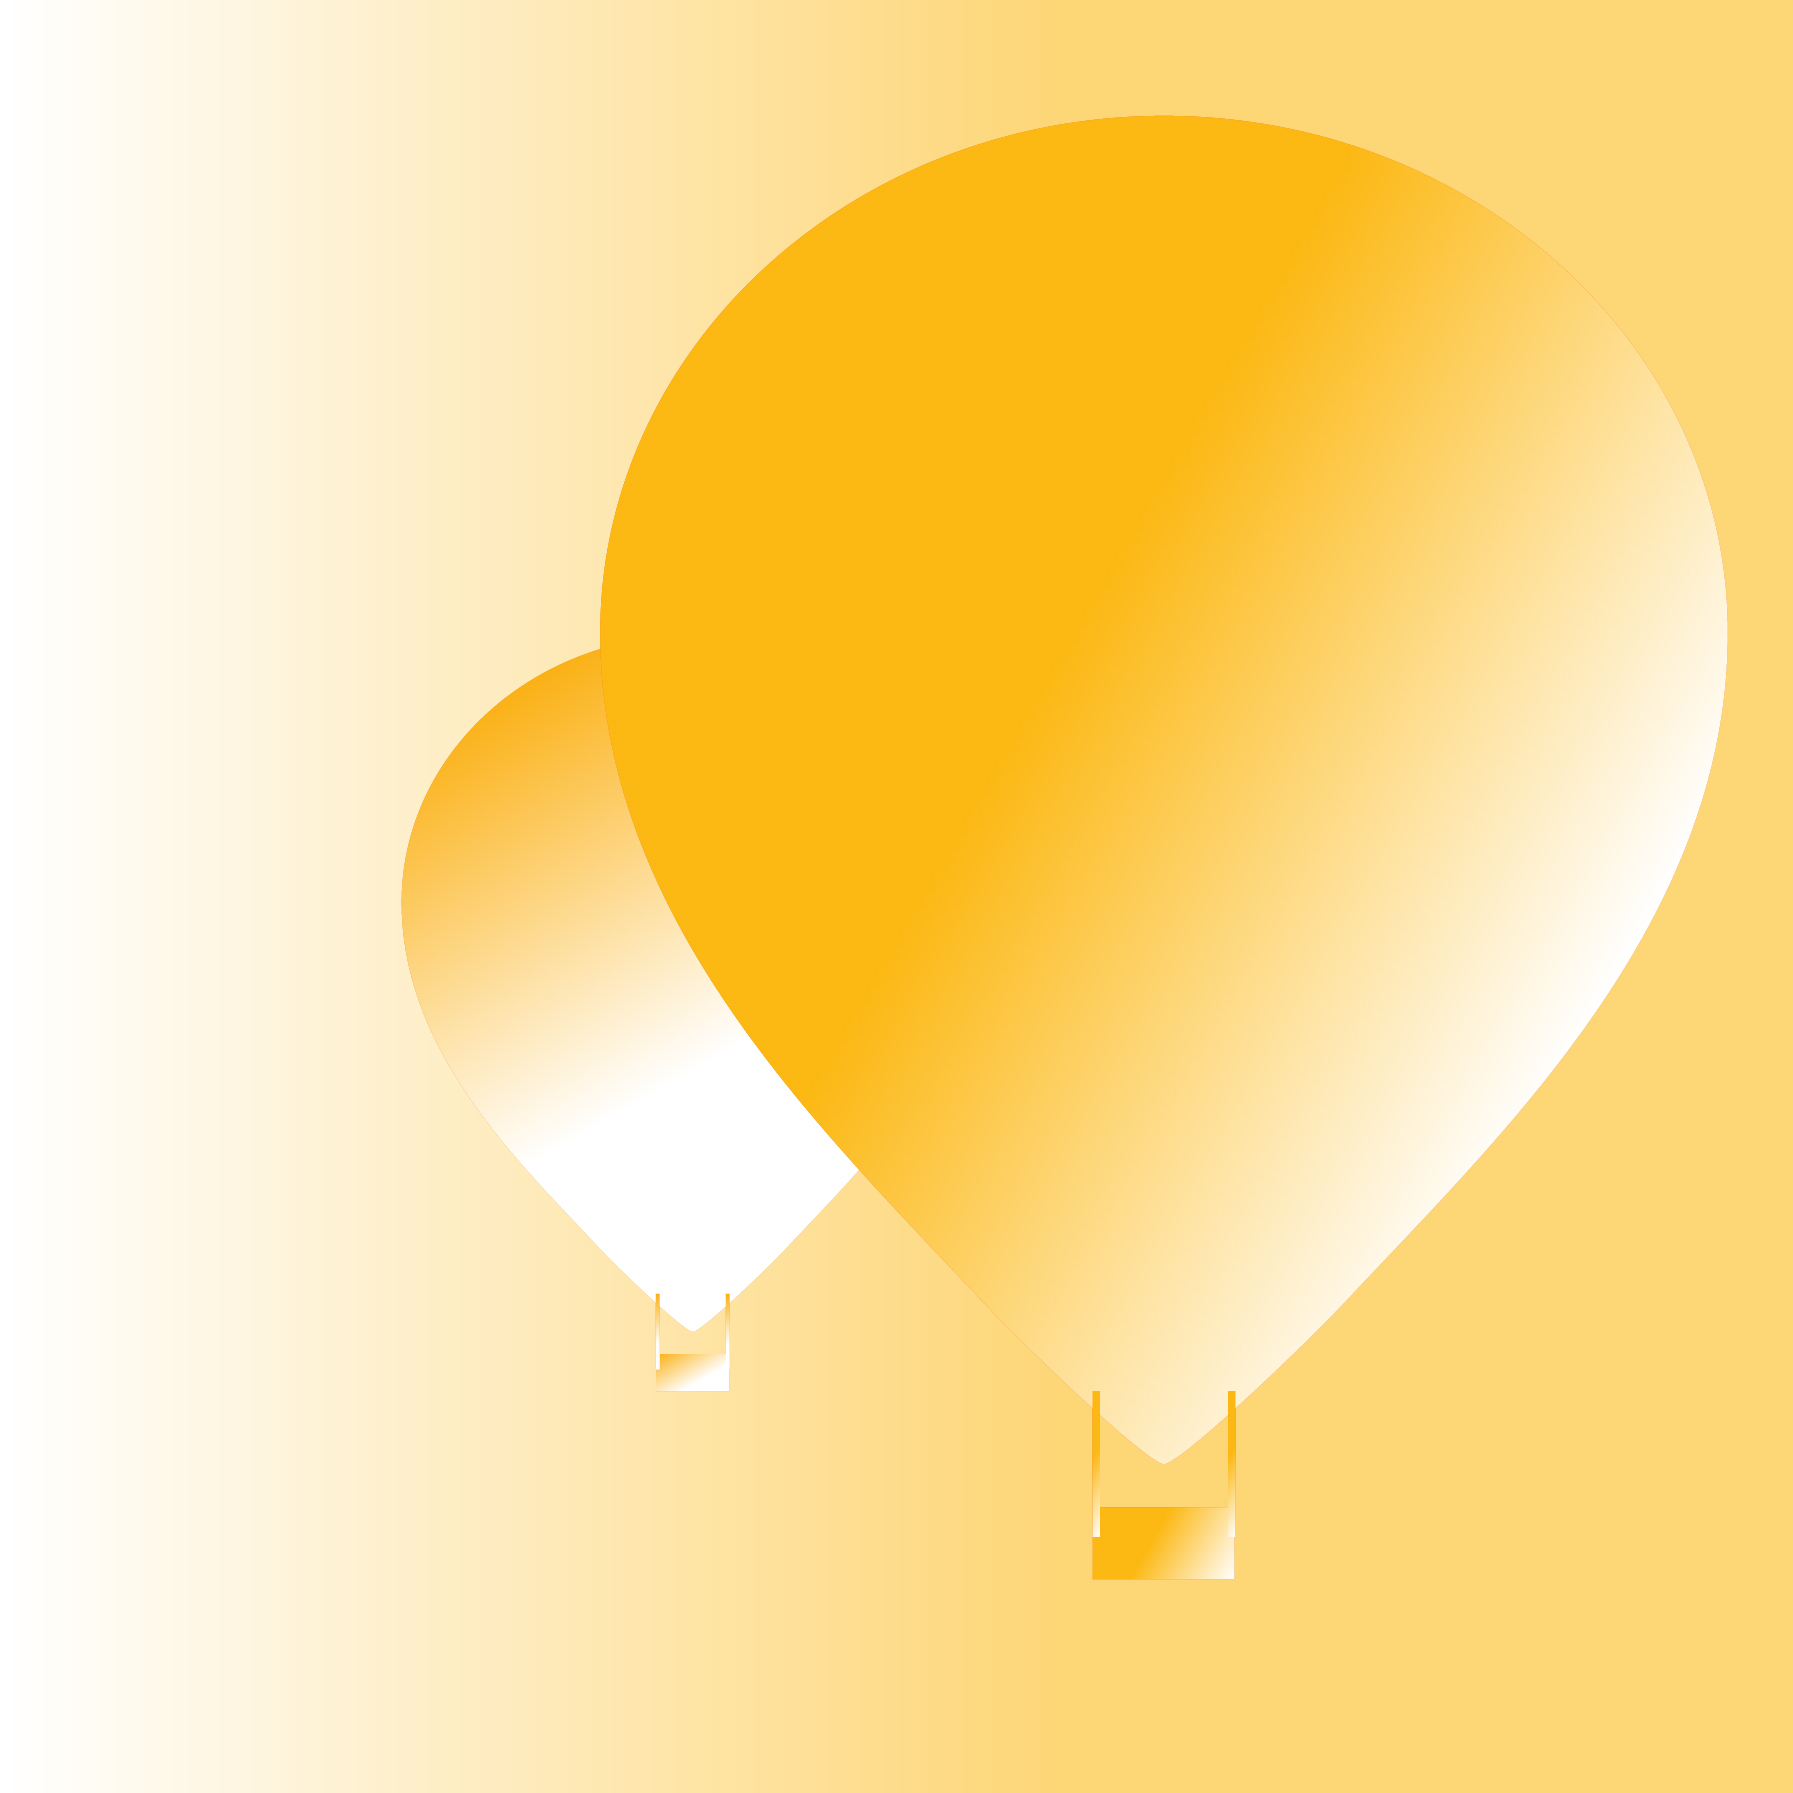 1792x1792ballon_megjelenesek_-03